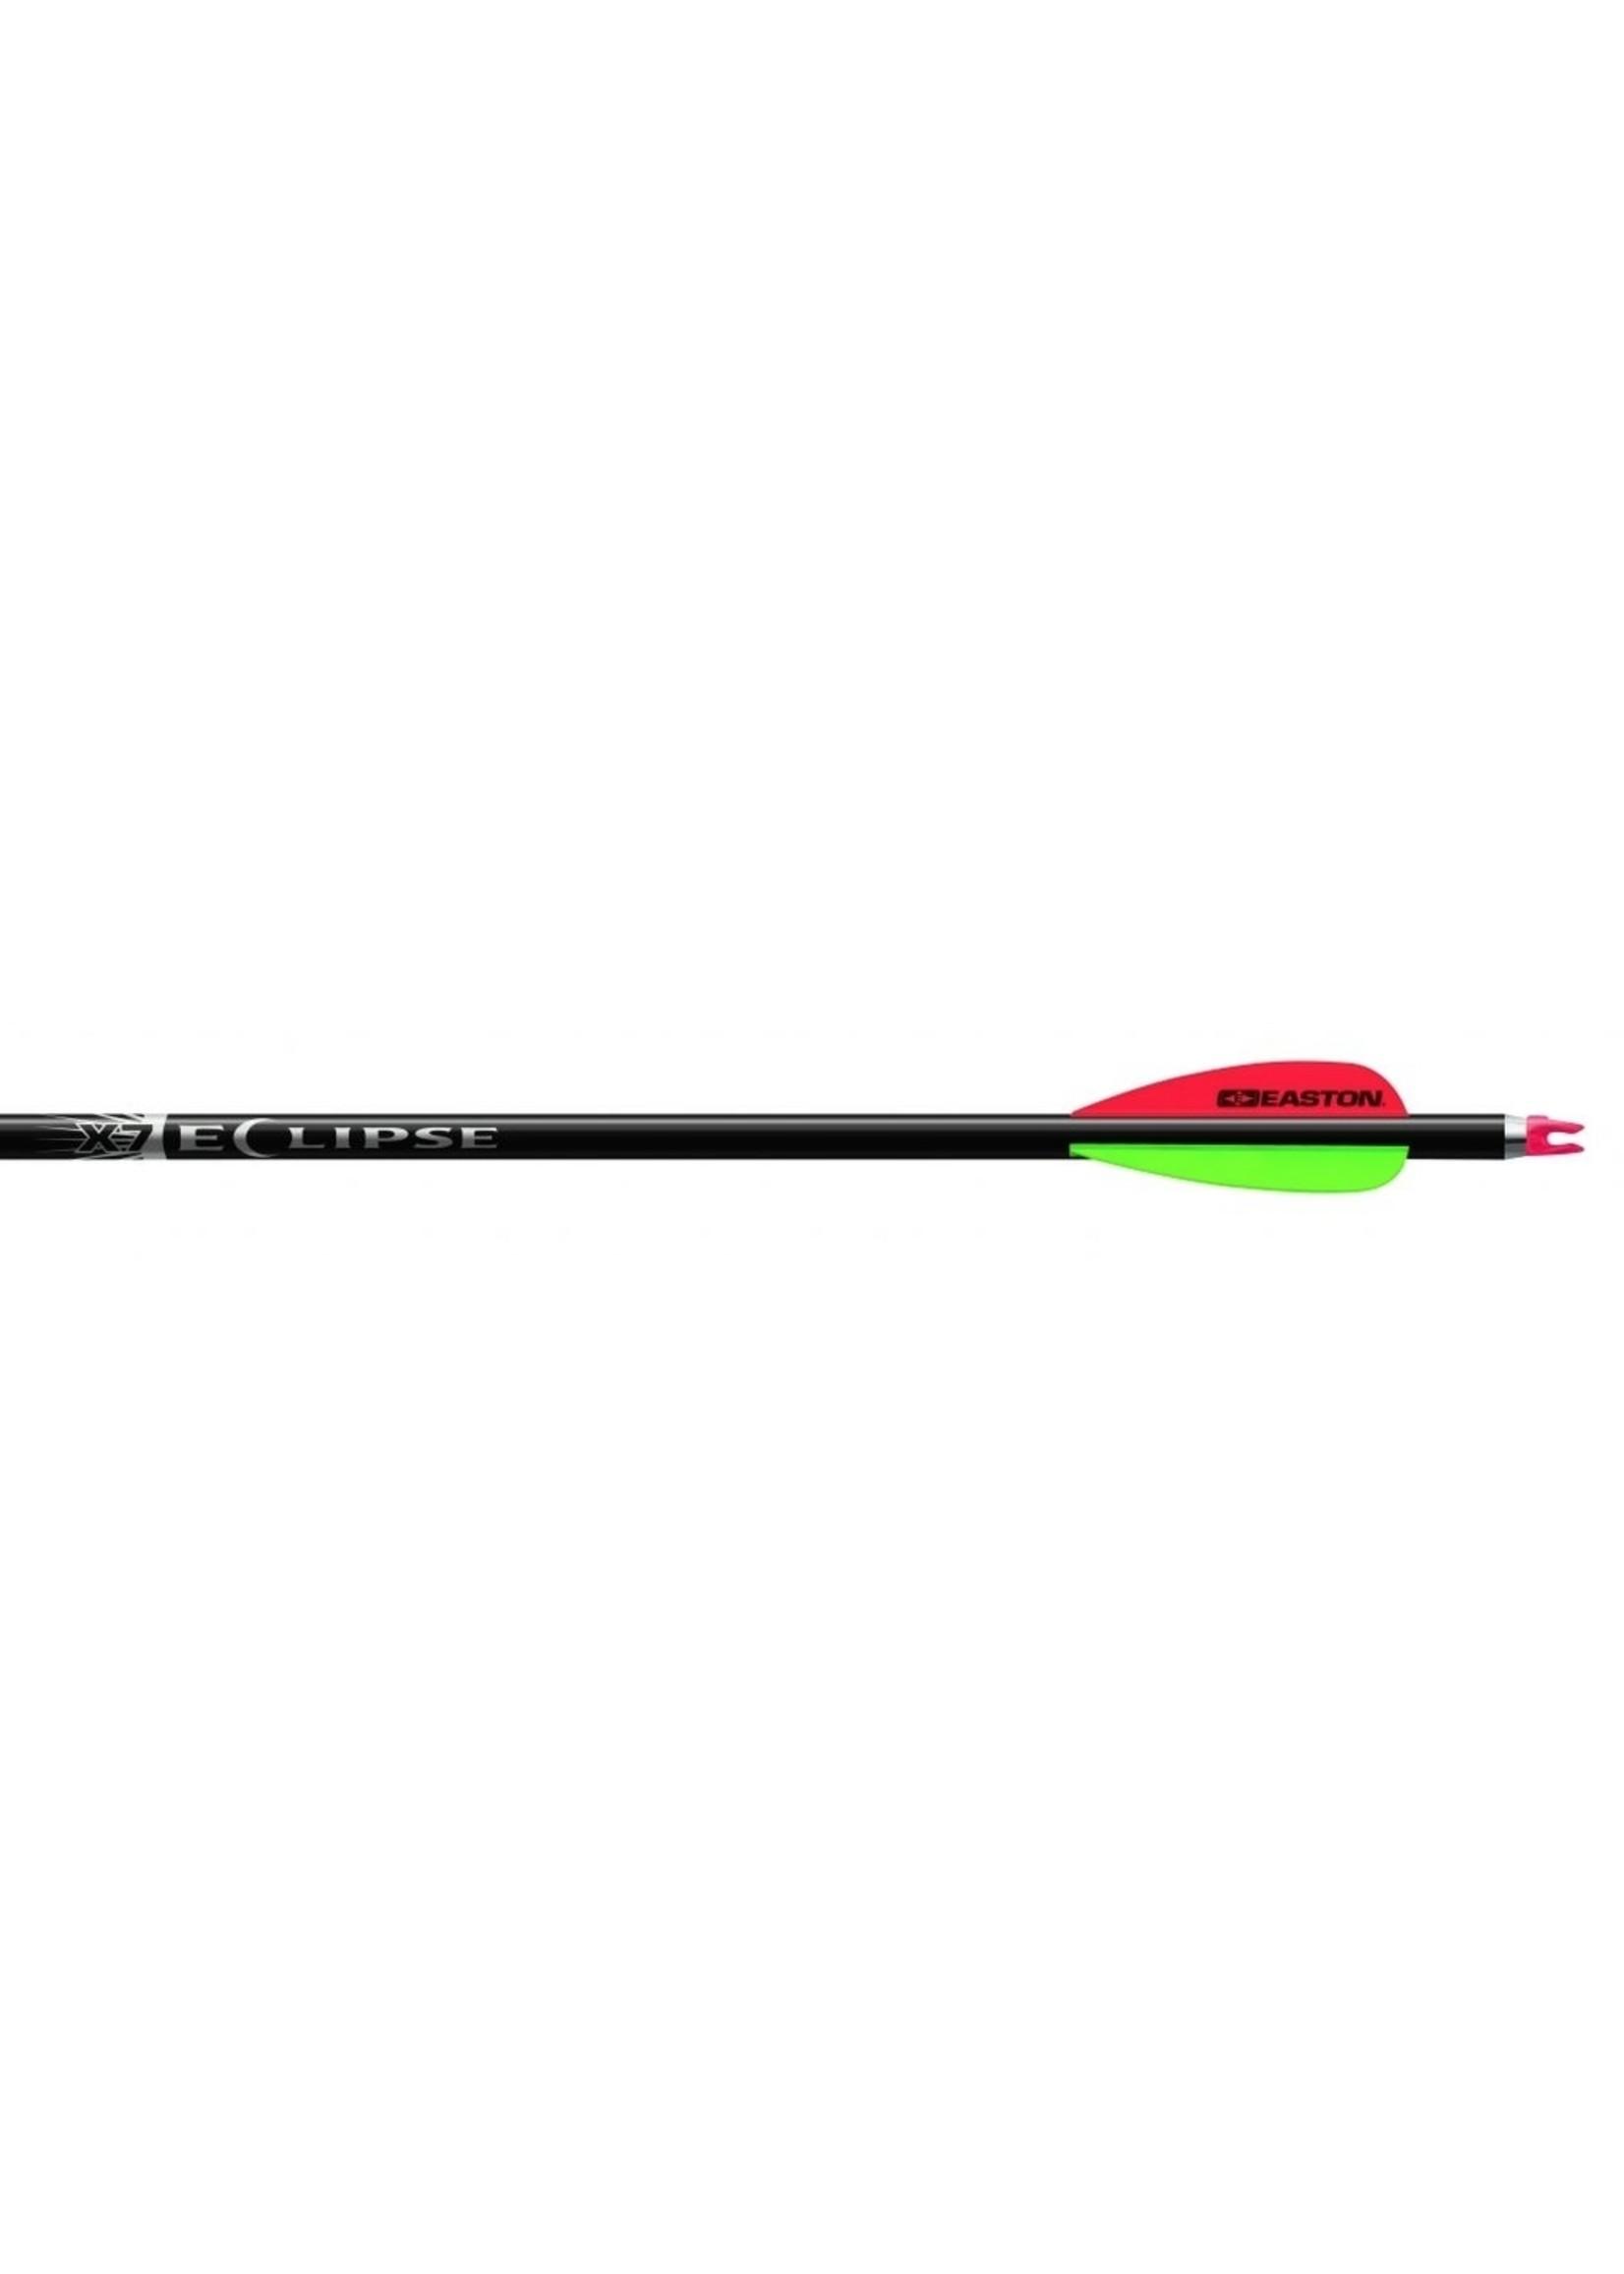 Easton Archery Easton Eclipse Shaft - each